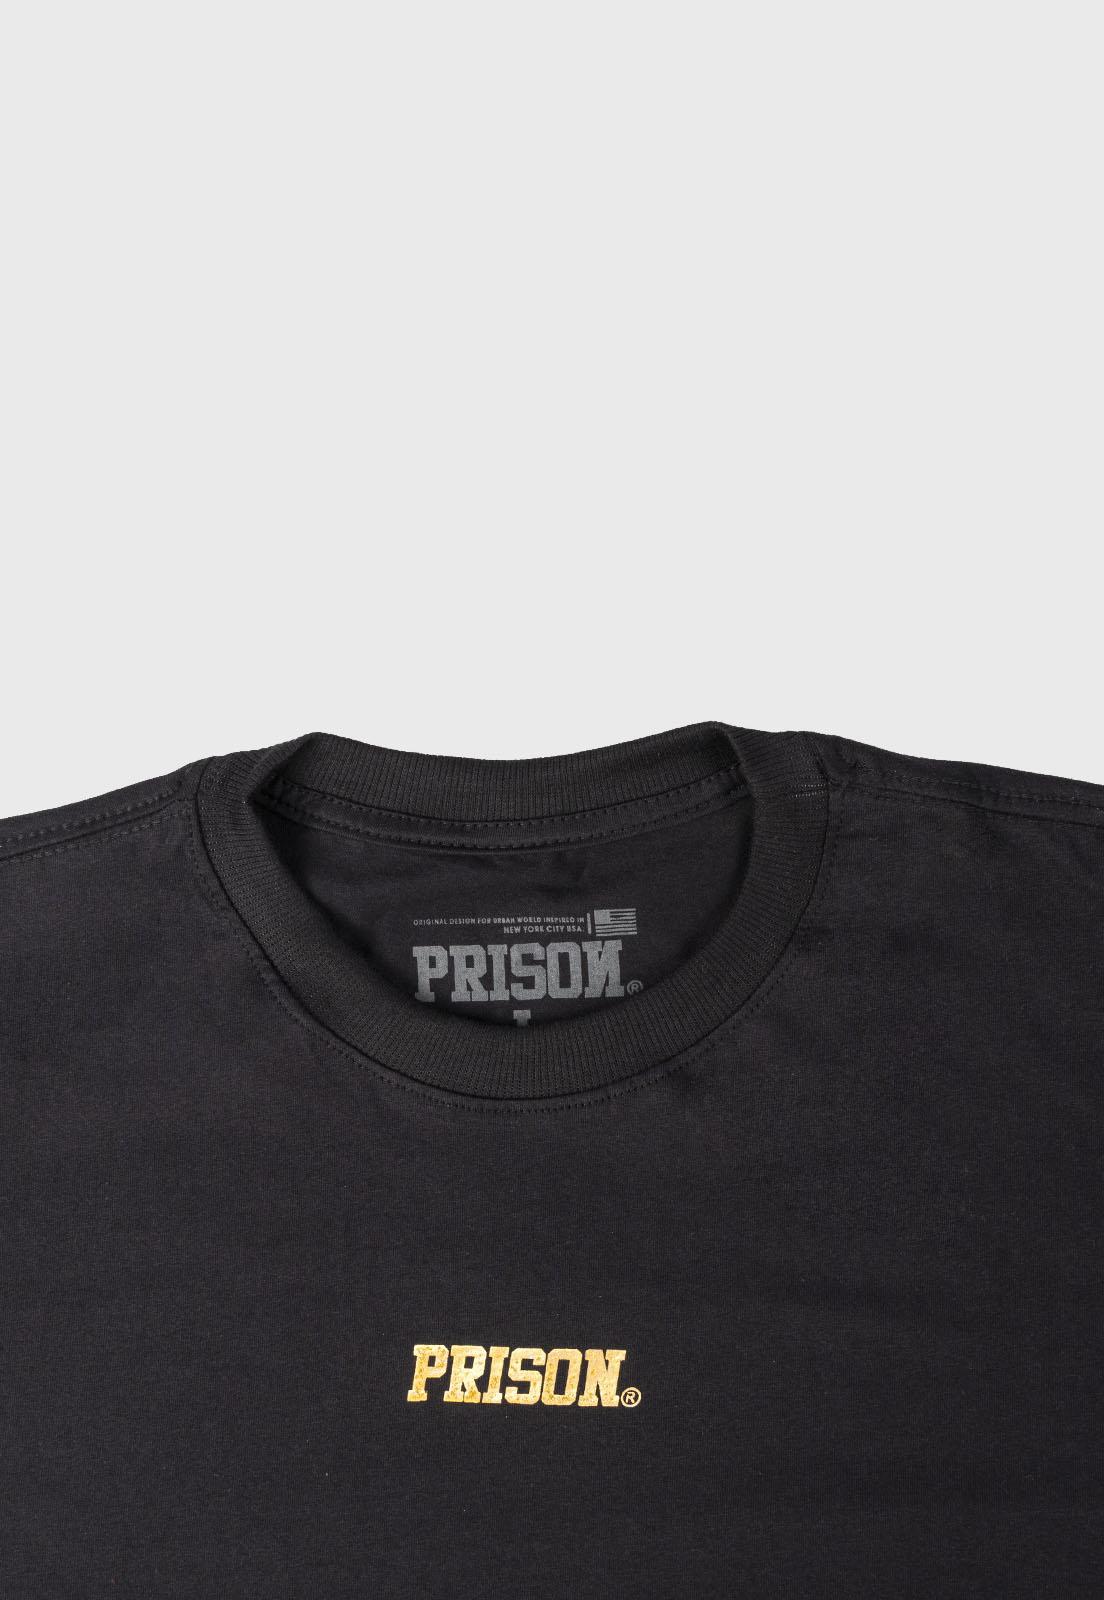 Camiseta Streetwear Prison Original Gold